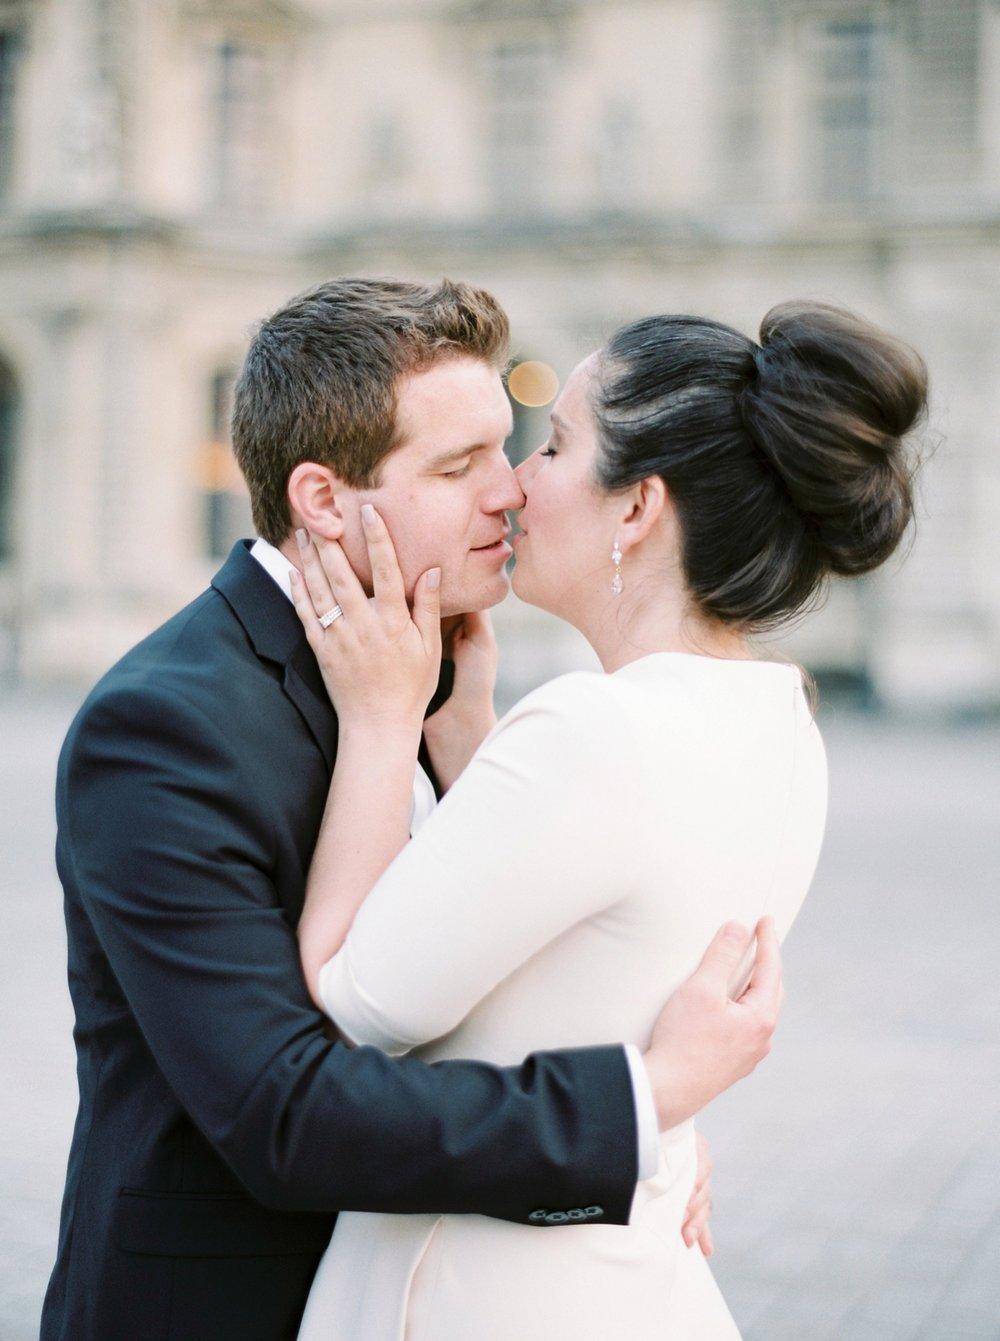 Paris weding photographers | pre wedding engagement session | fine art film photographer justine milton